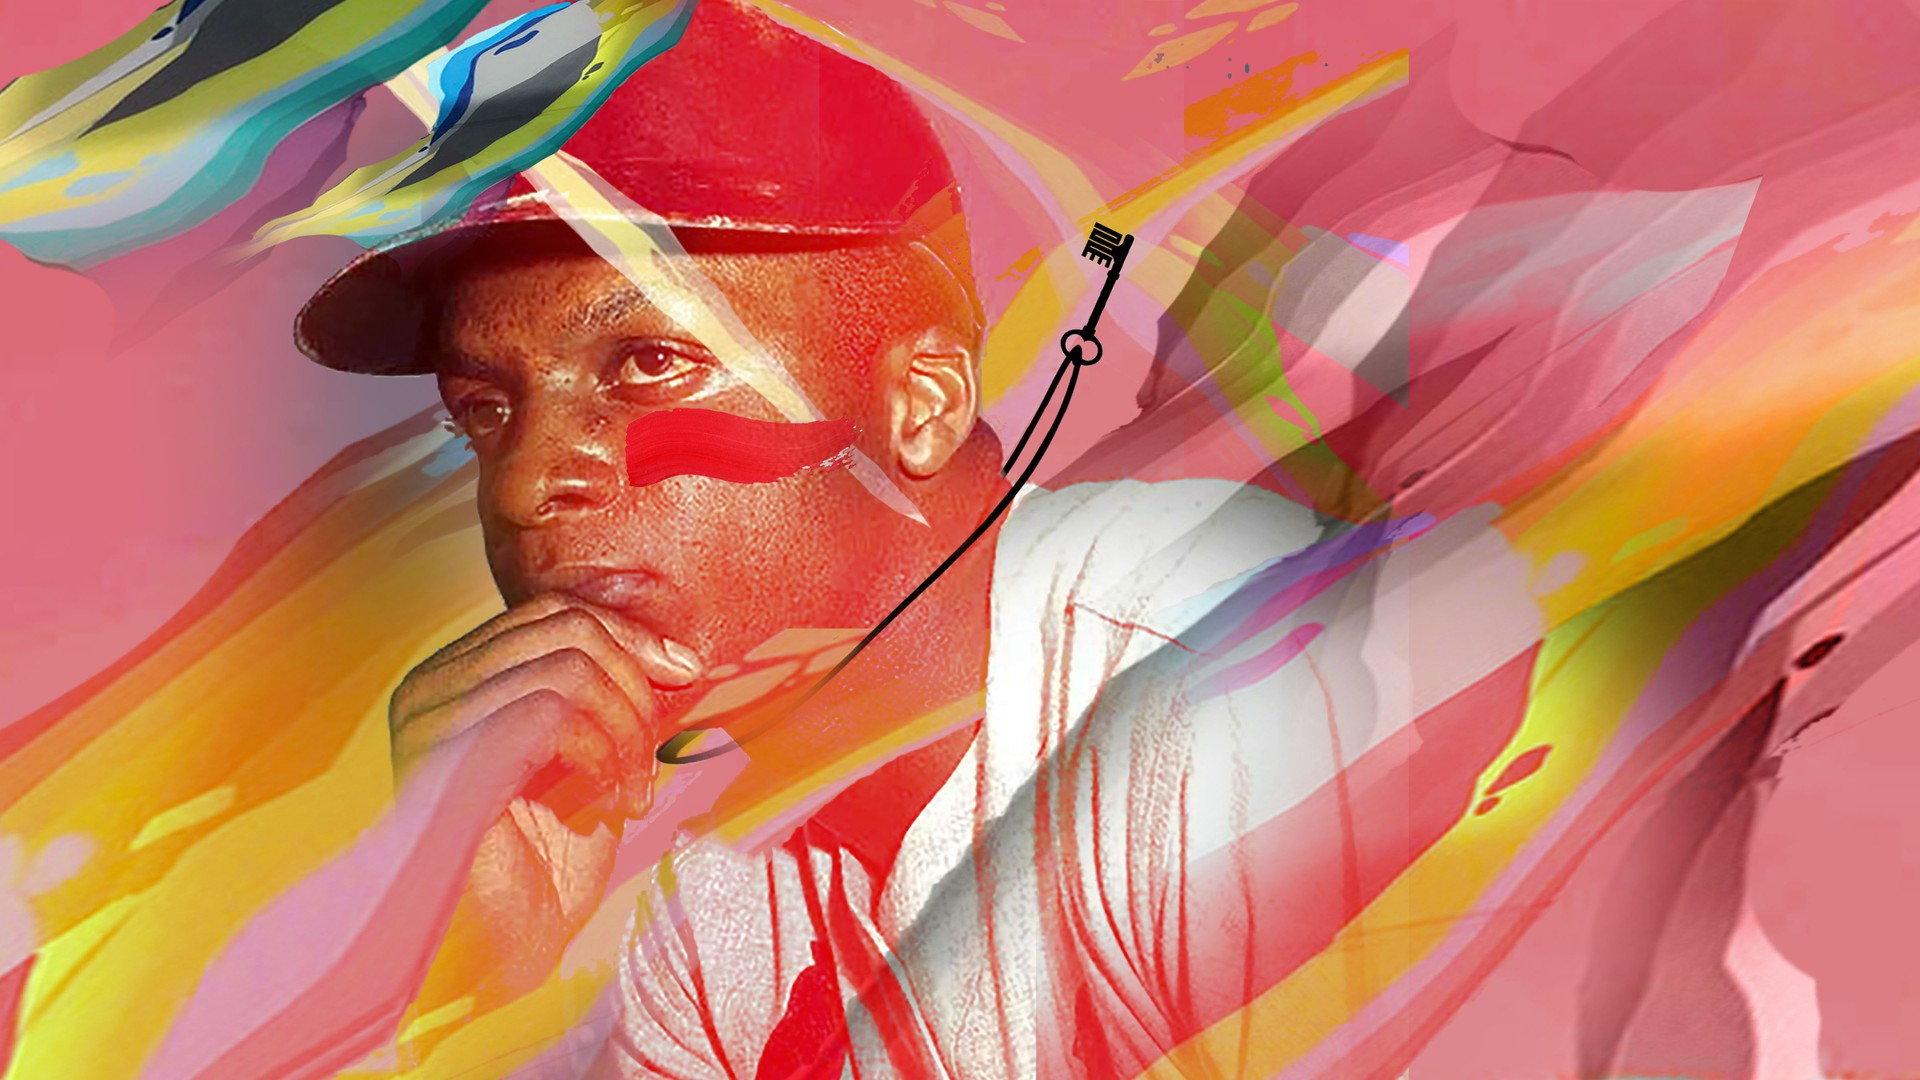 colorful photo illustration of Curt Flood